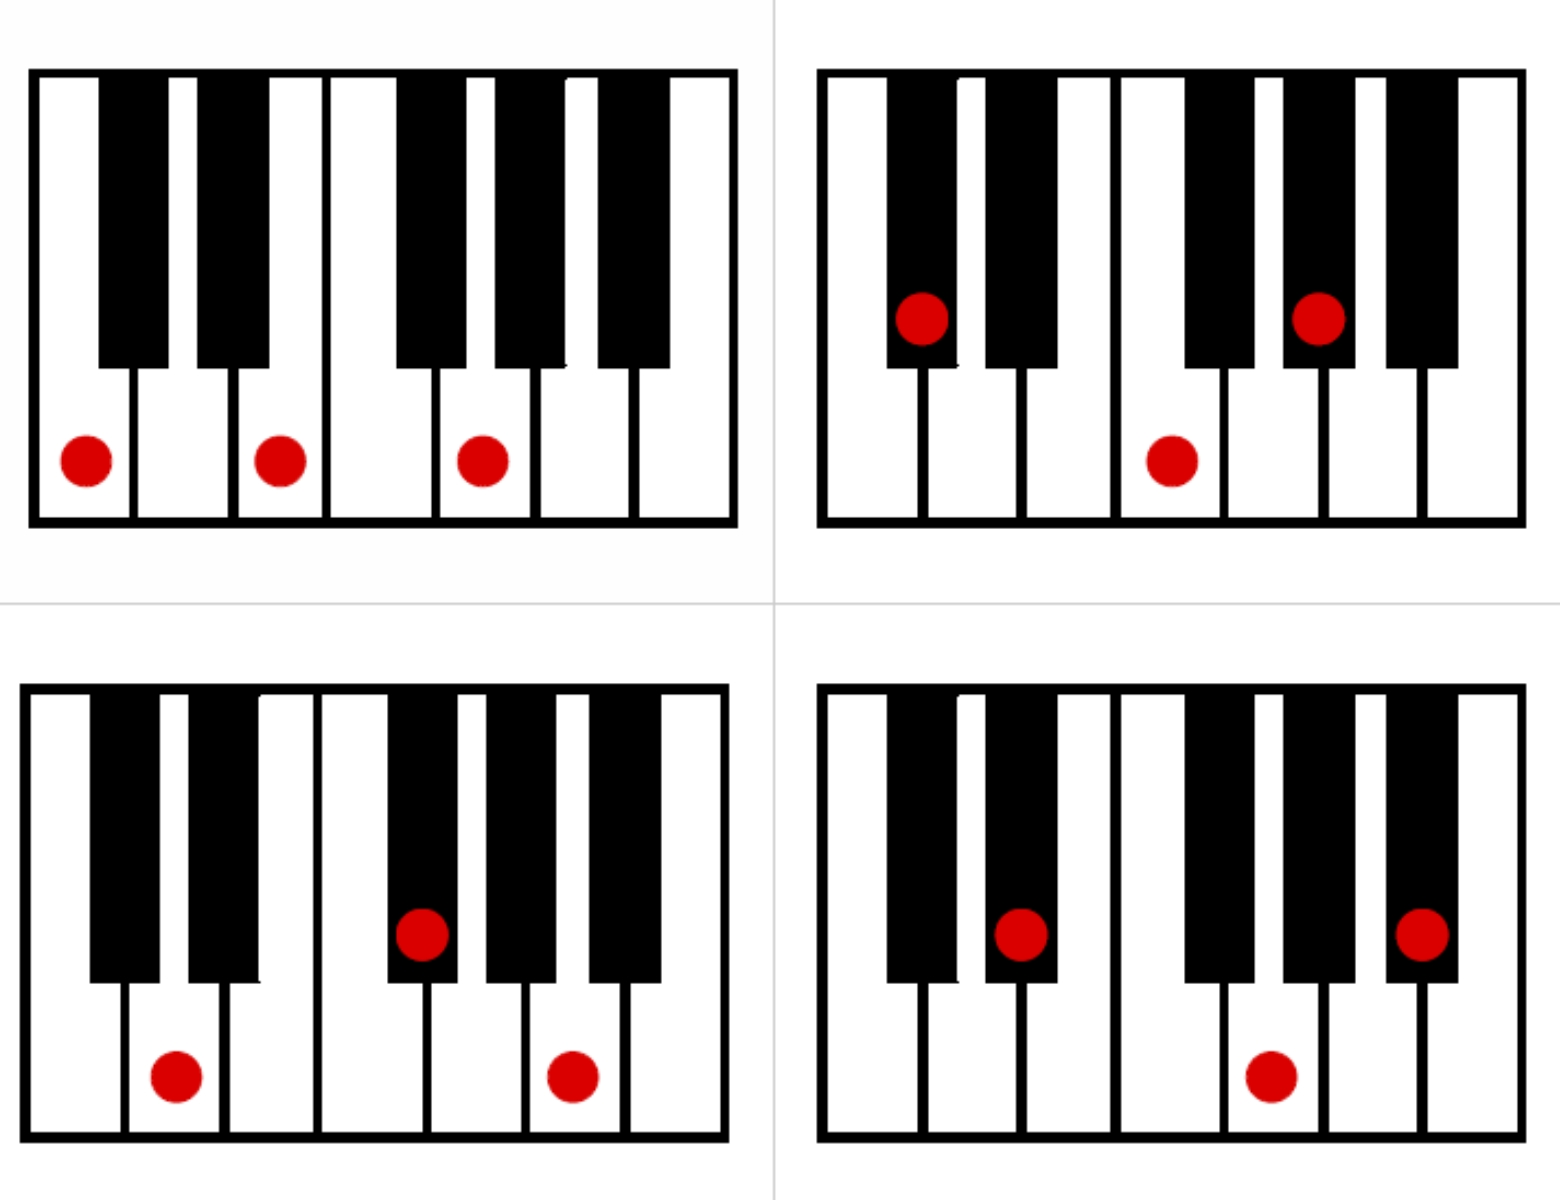 Full piano keyboard keyboard major triads